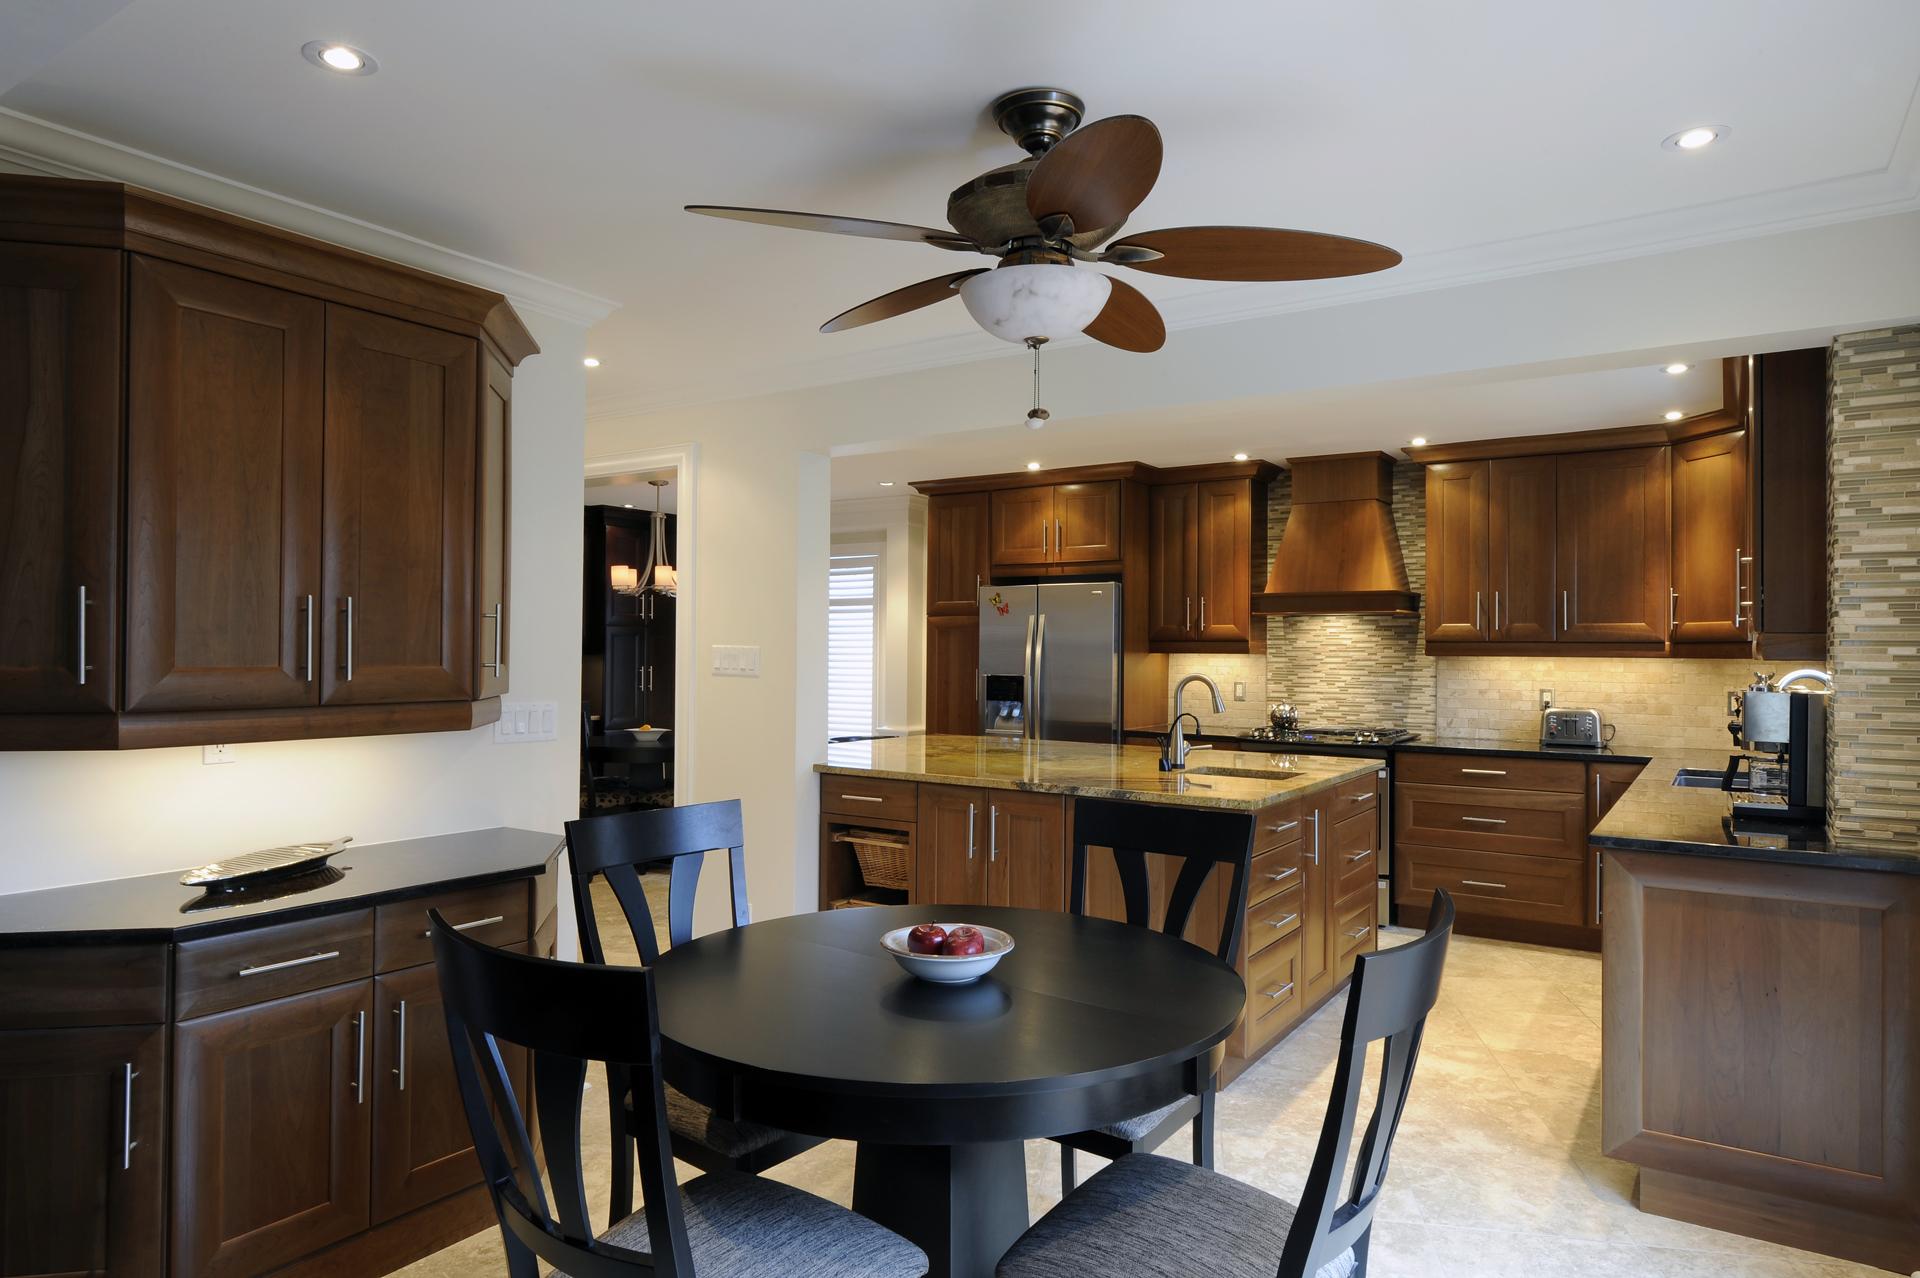 Santoro kitchen 4.jpg